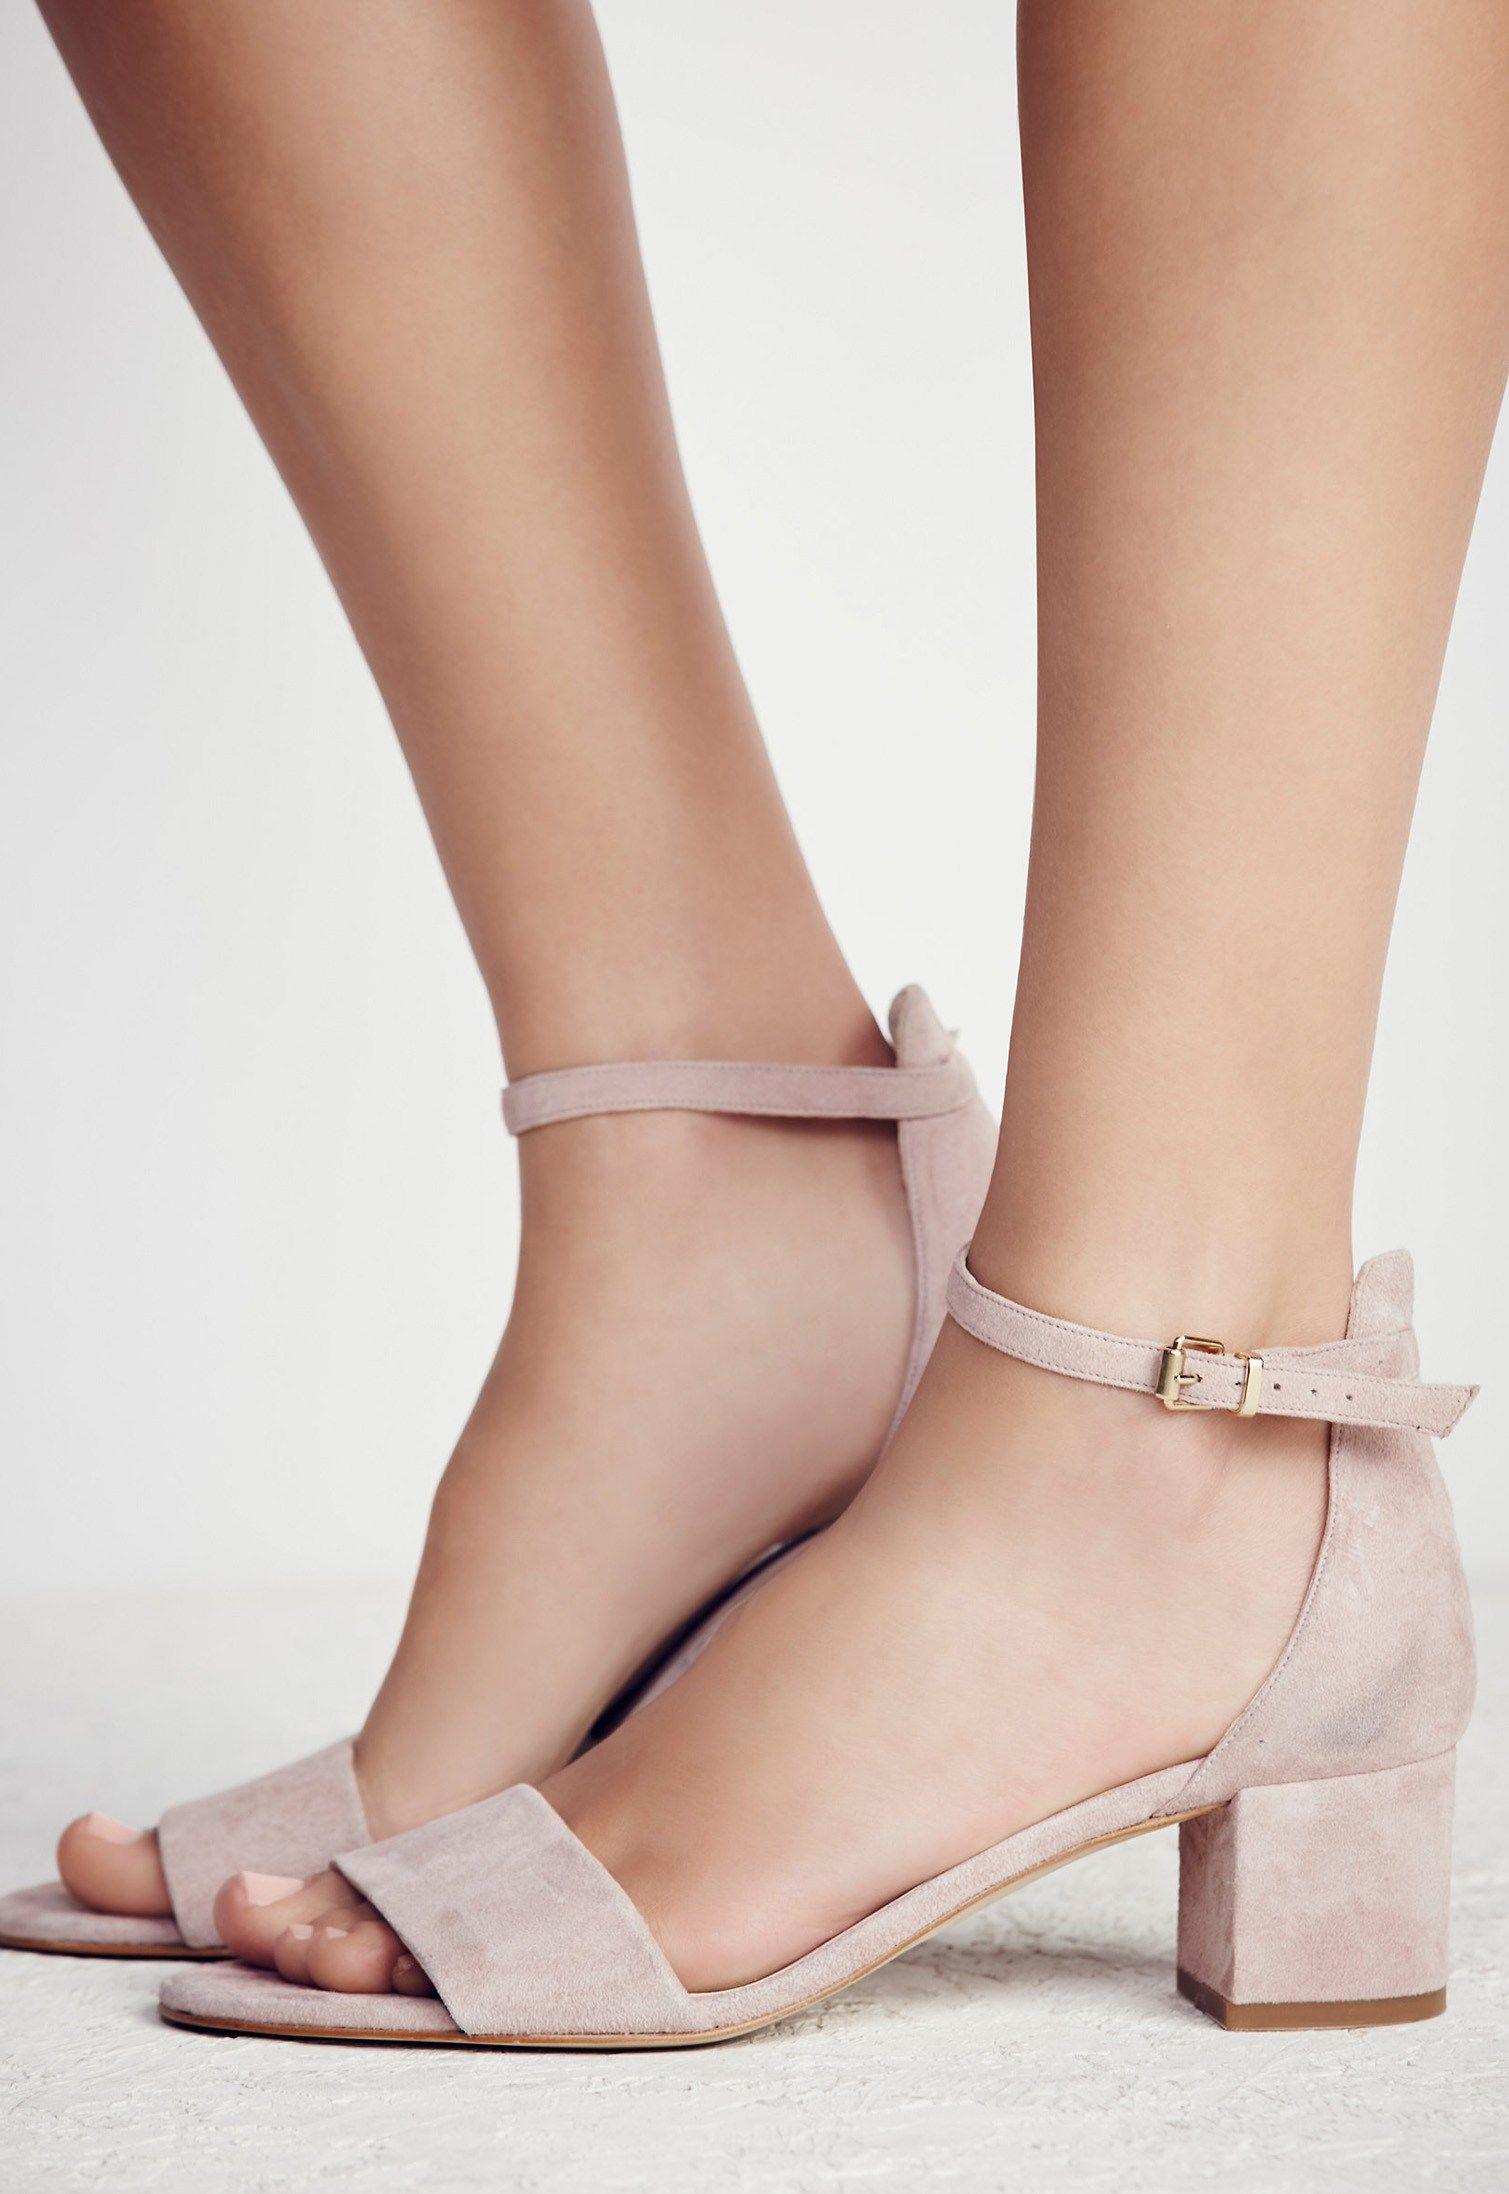 ec12afe9774 Marigold Block Heel in Blush by Free People    Made from beautiful Spanish  craftsmanship